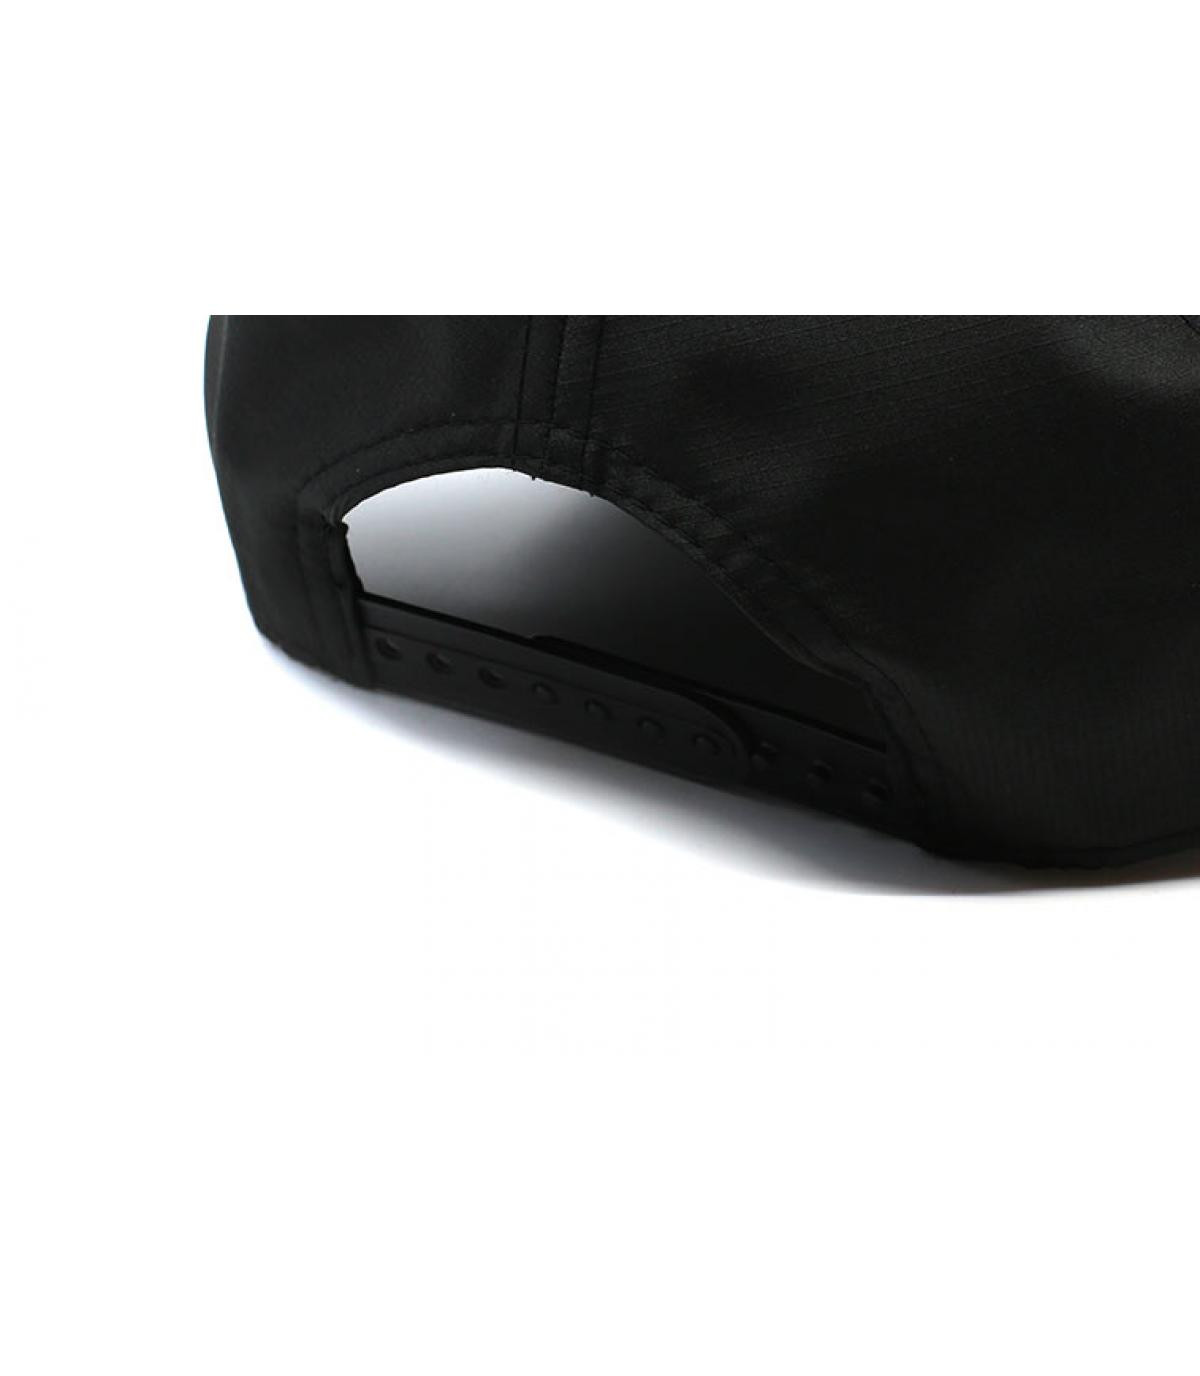 Details Cap Ripstop NY Aframe black maroon - Abbildung 5